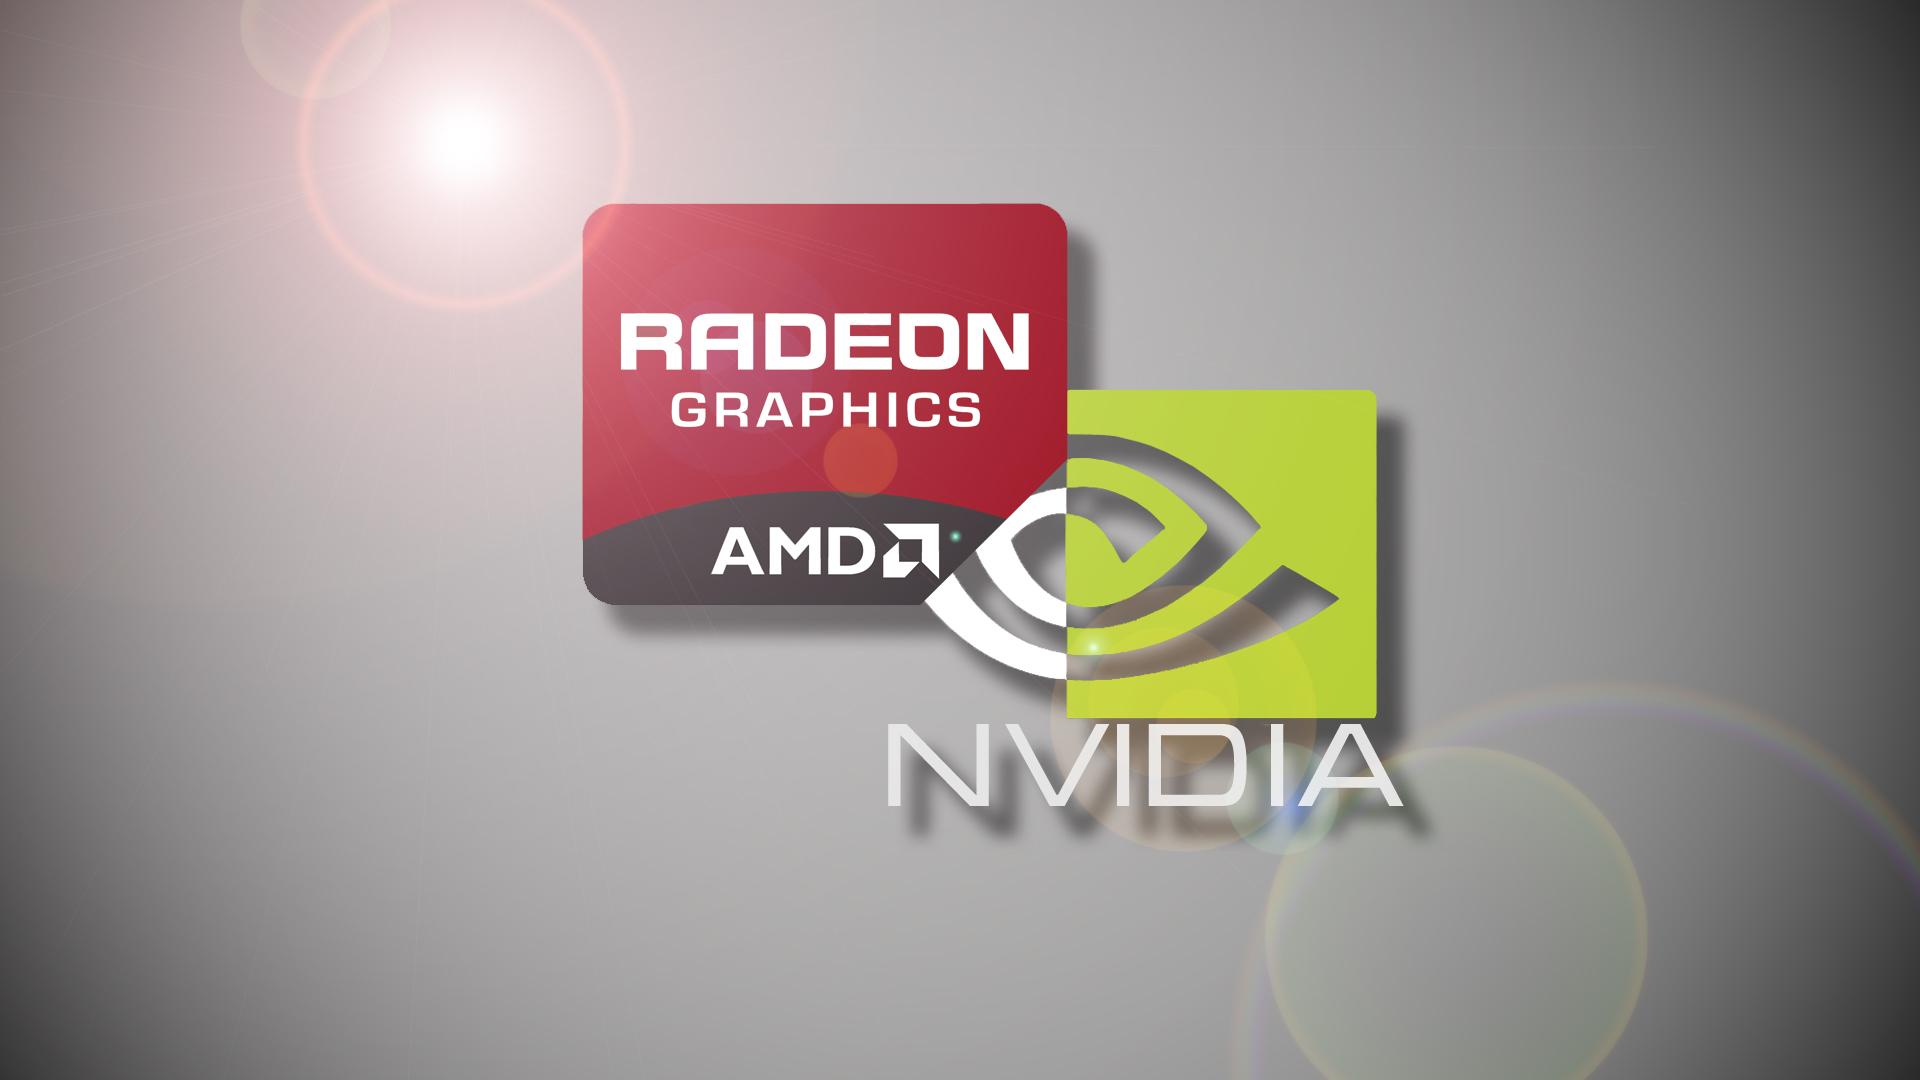 Майнинг как залог будущего роста акций компаний AMD и Nvidia